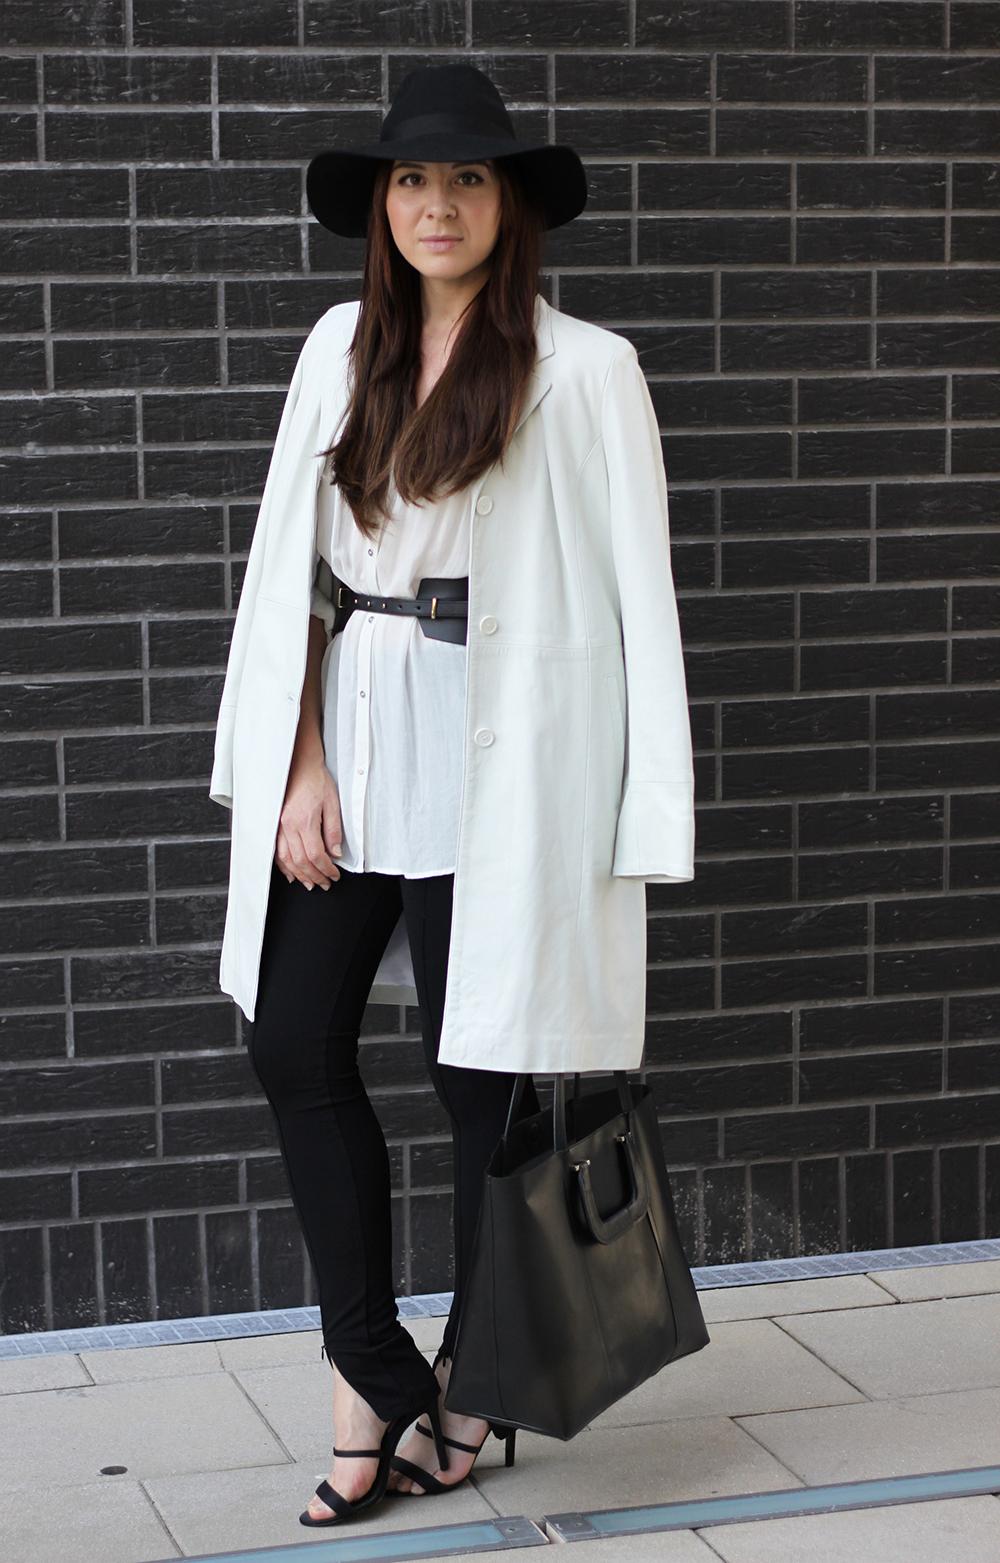 who is mocca, fashionblog tirol, fashionblog österreich, leggings H&M, high heels, ledermantel weiß vintage kleiderkreisel, bluse baumwolle, taillengürtel breit